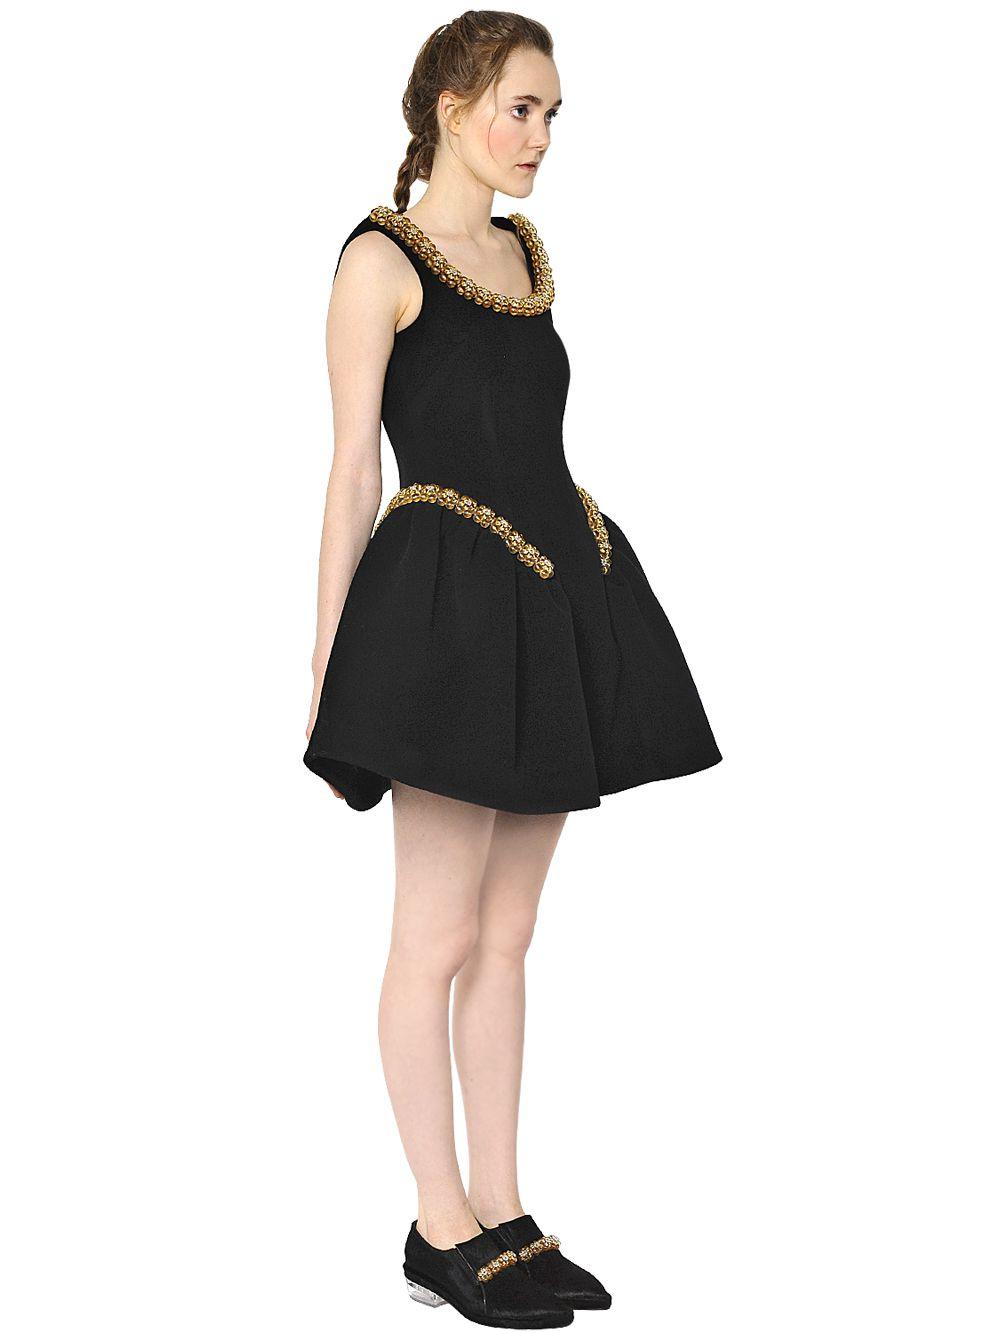 62668e3d99541 Lyst - Simone Rocha Bonded Wool   Neoprene Dress in Black